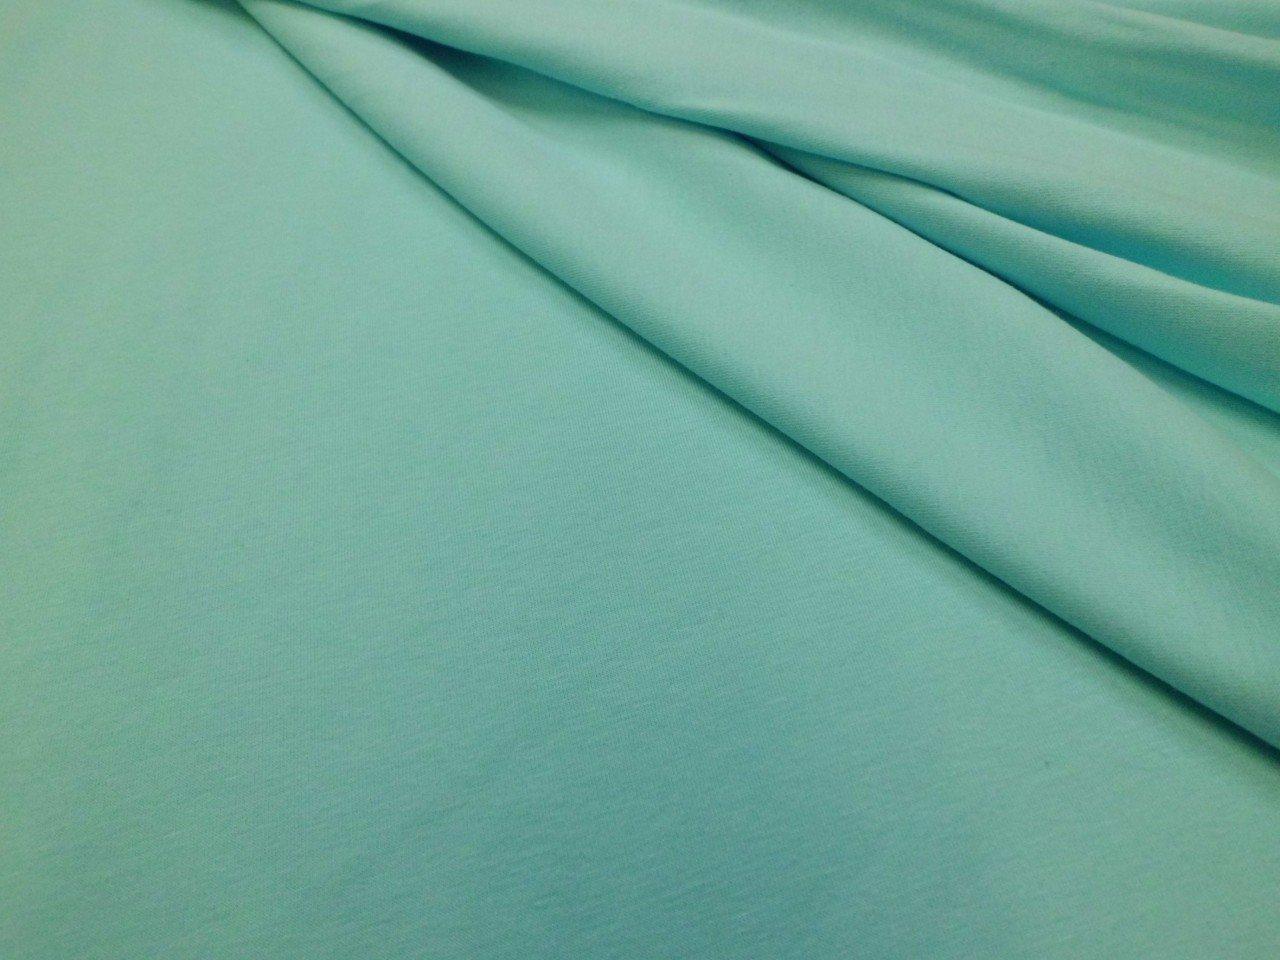 Cotton & Lycra Jersey Knit in Aqua